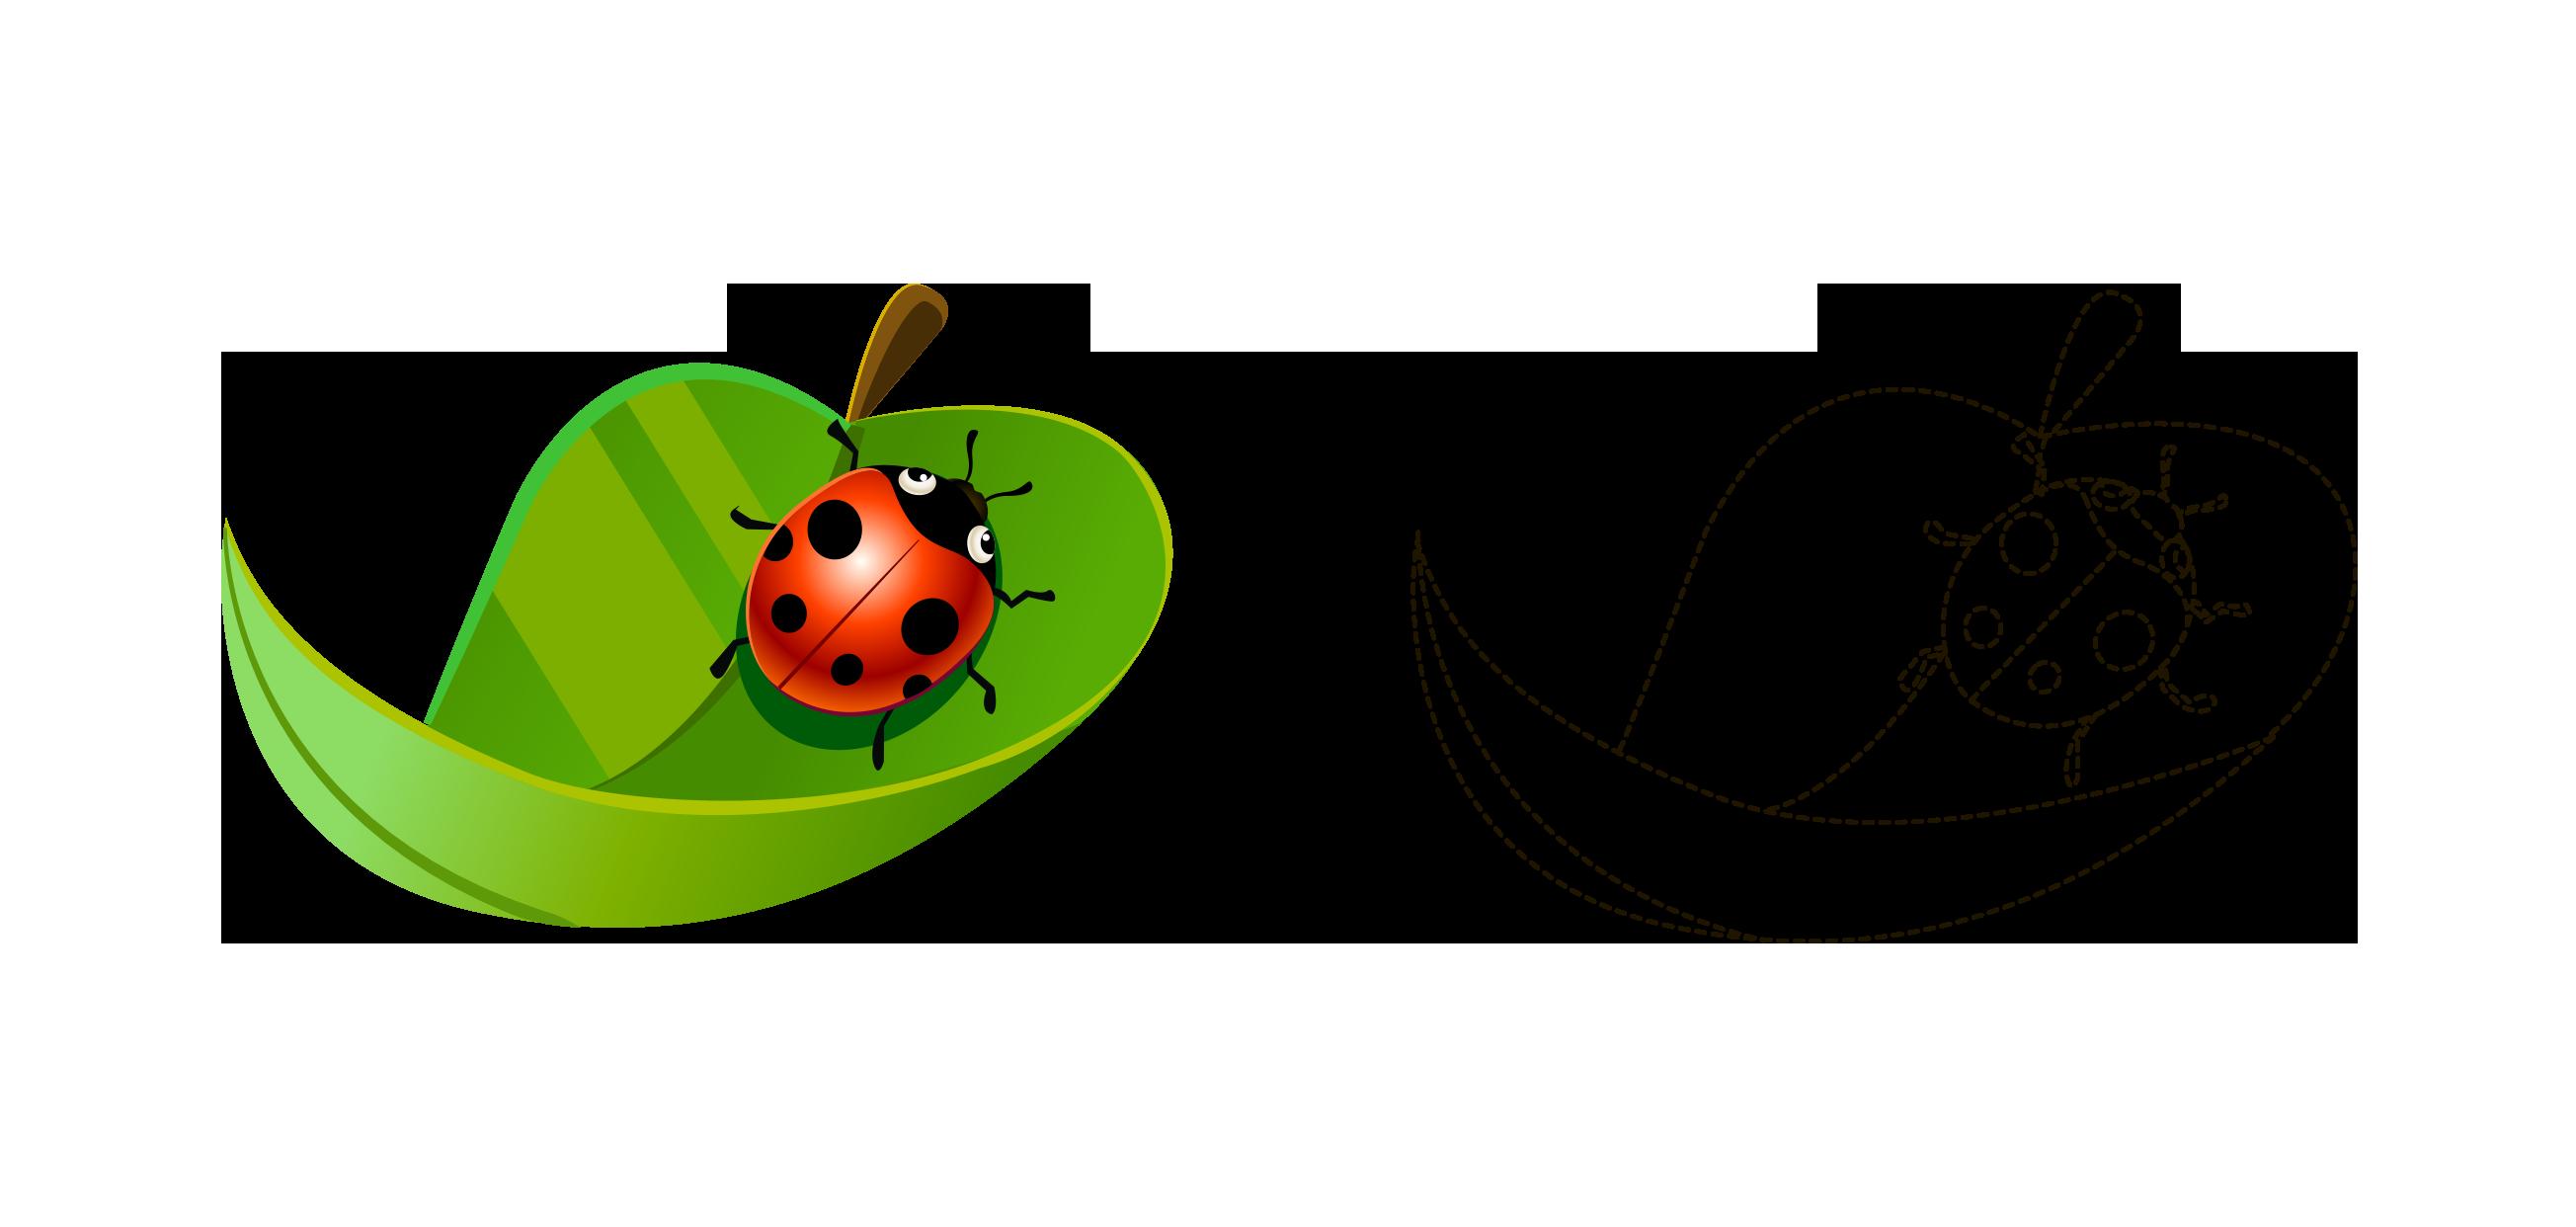 Ladybug clipart watercolor. Coccinella septempunctata cartoon painted